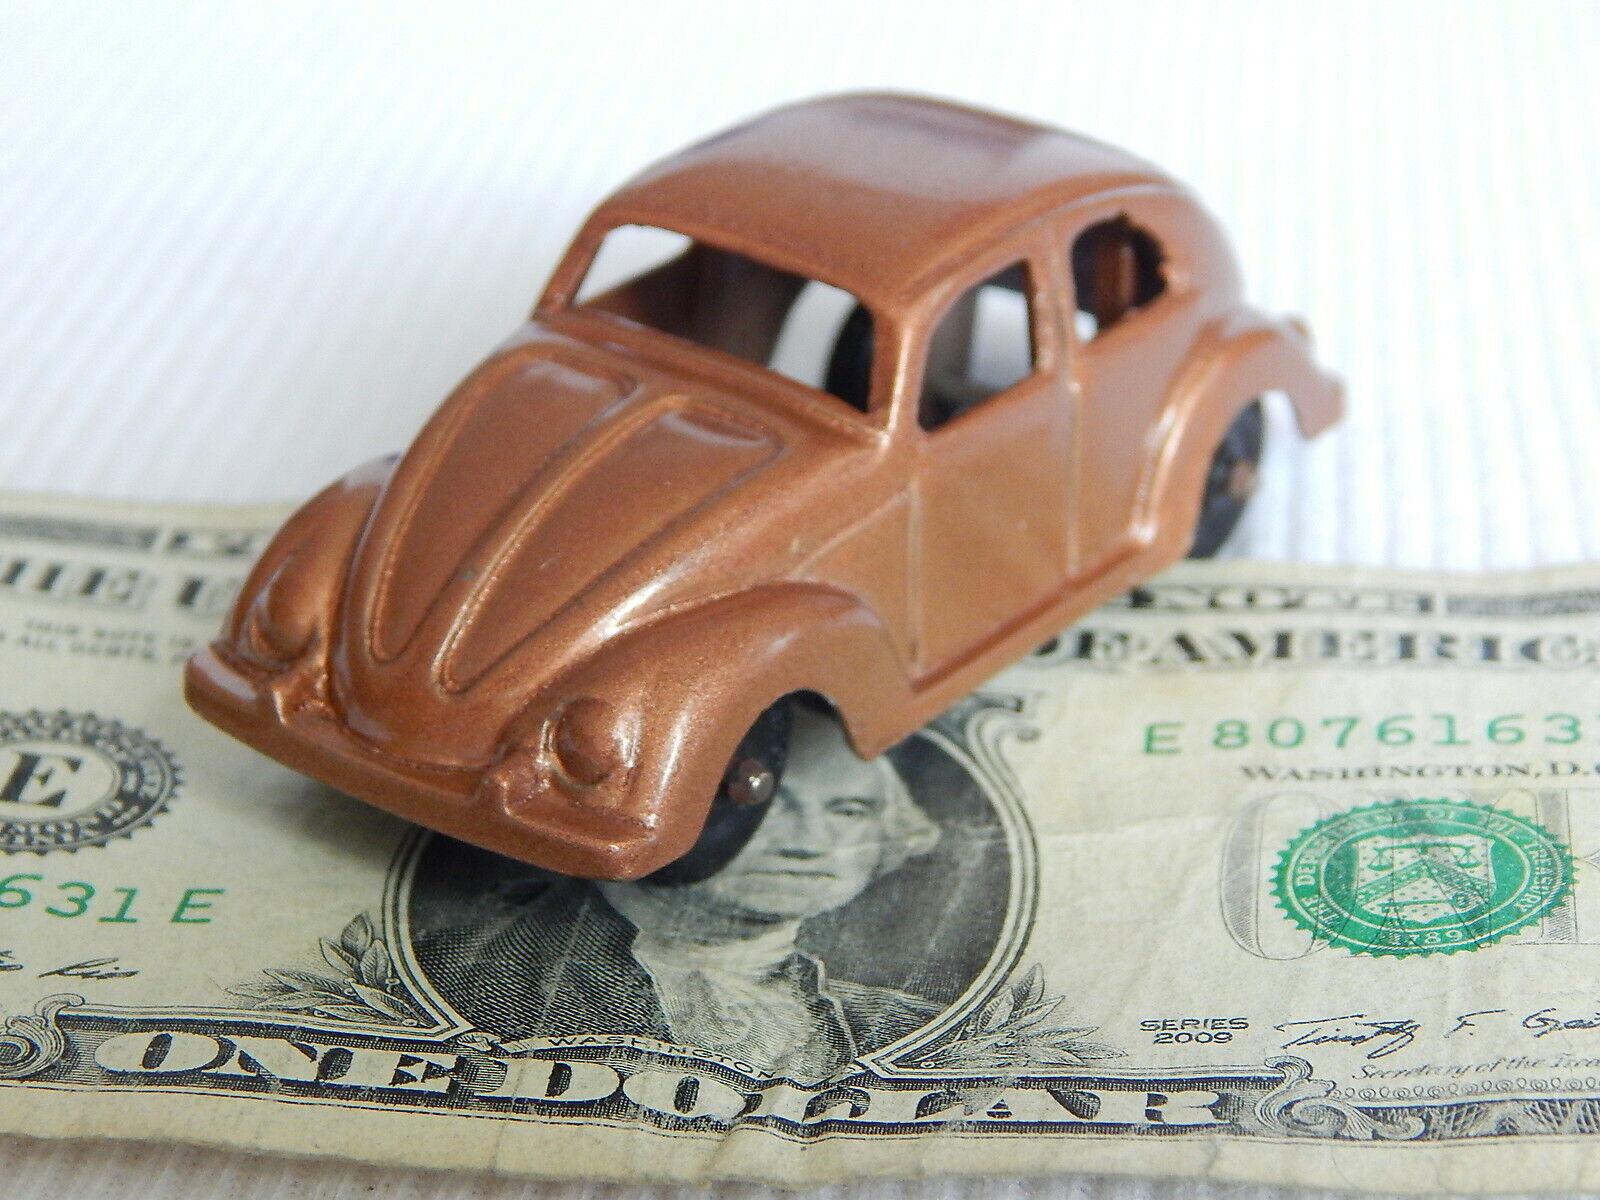 Tootsietoy De Colección 1960 Volkswagen VW Beetle Bug 3  bronce cobre coche de juguete Diecast